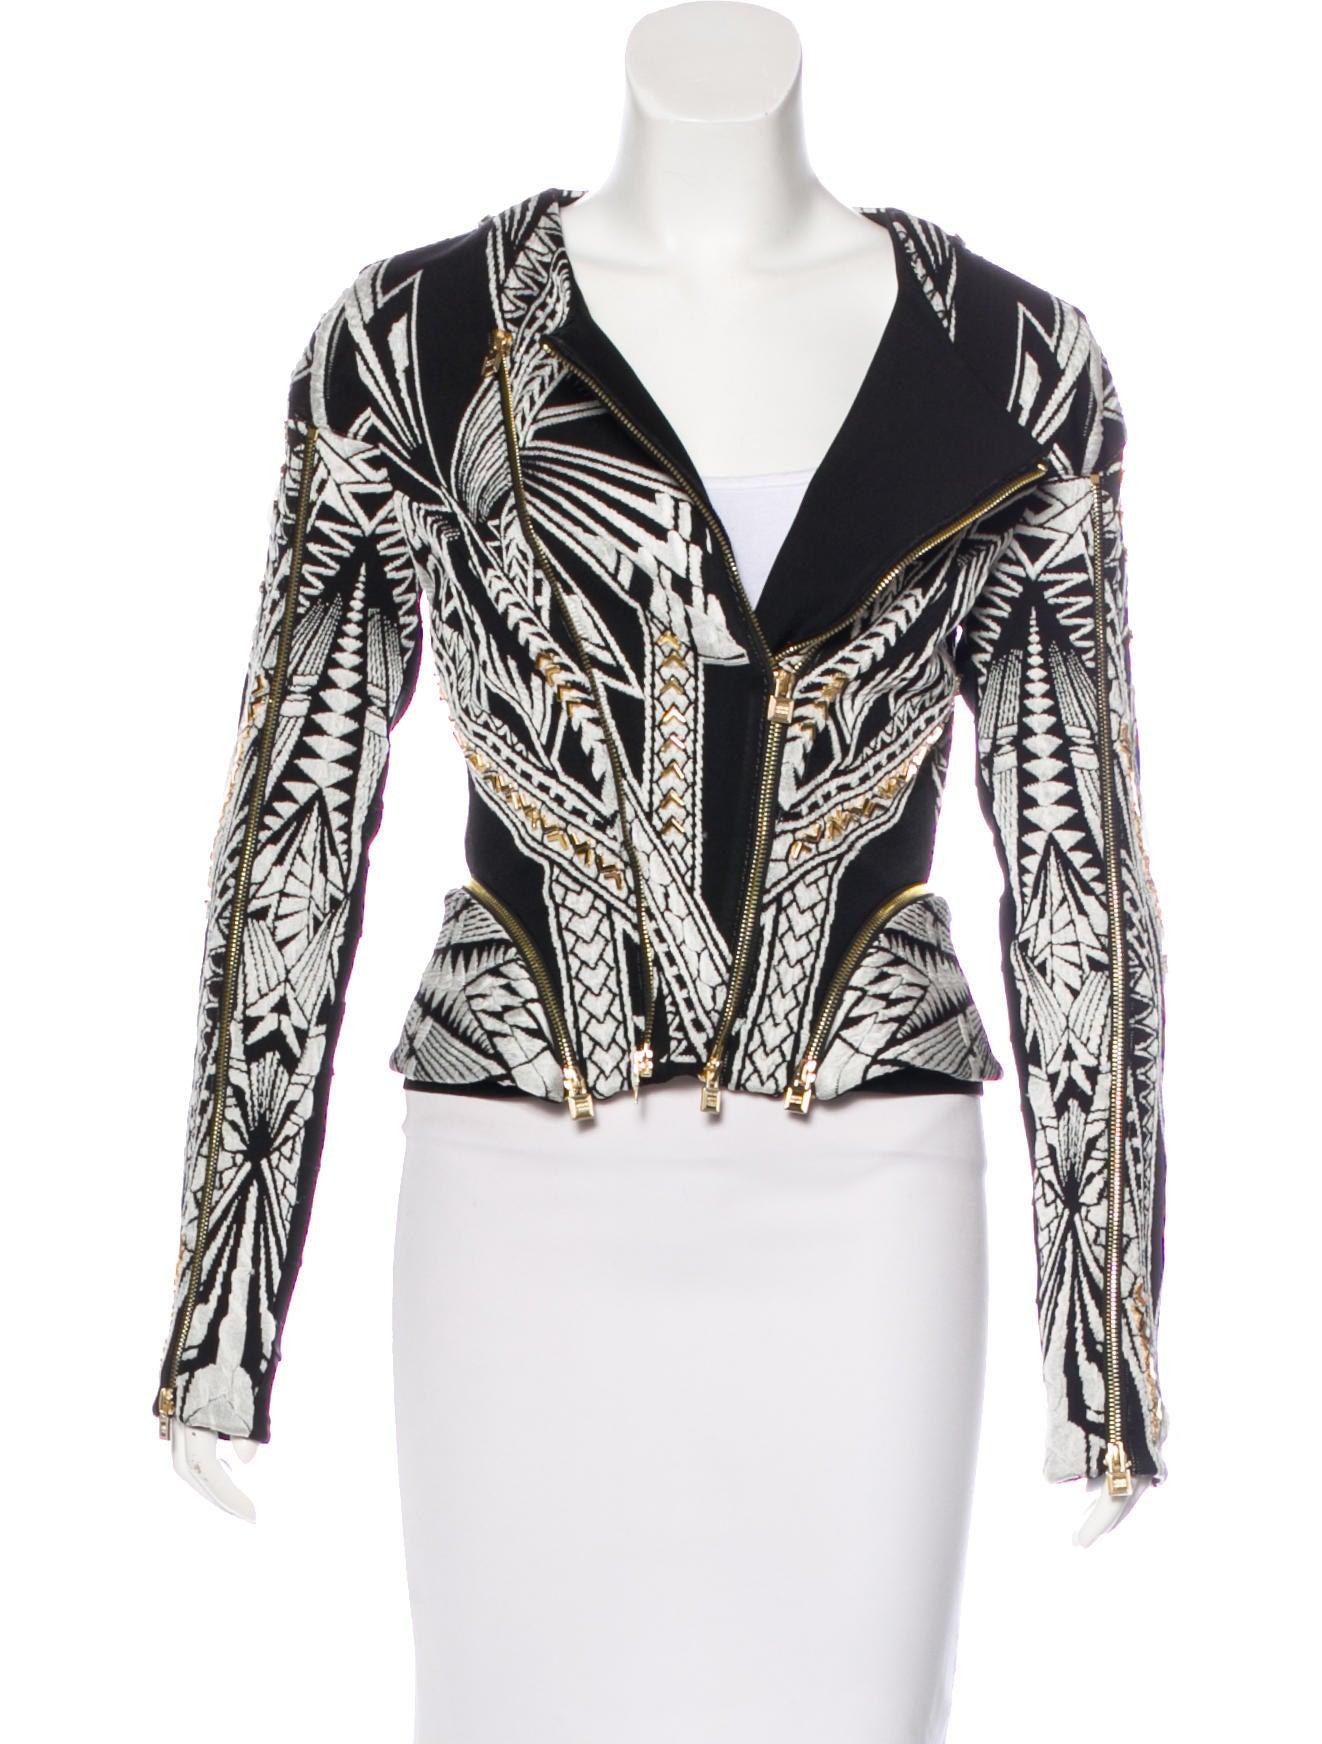 4eb129588f99 Herve Leger Sabah Tattoo Jacquard Jacket - Clothing - HEV32505